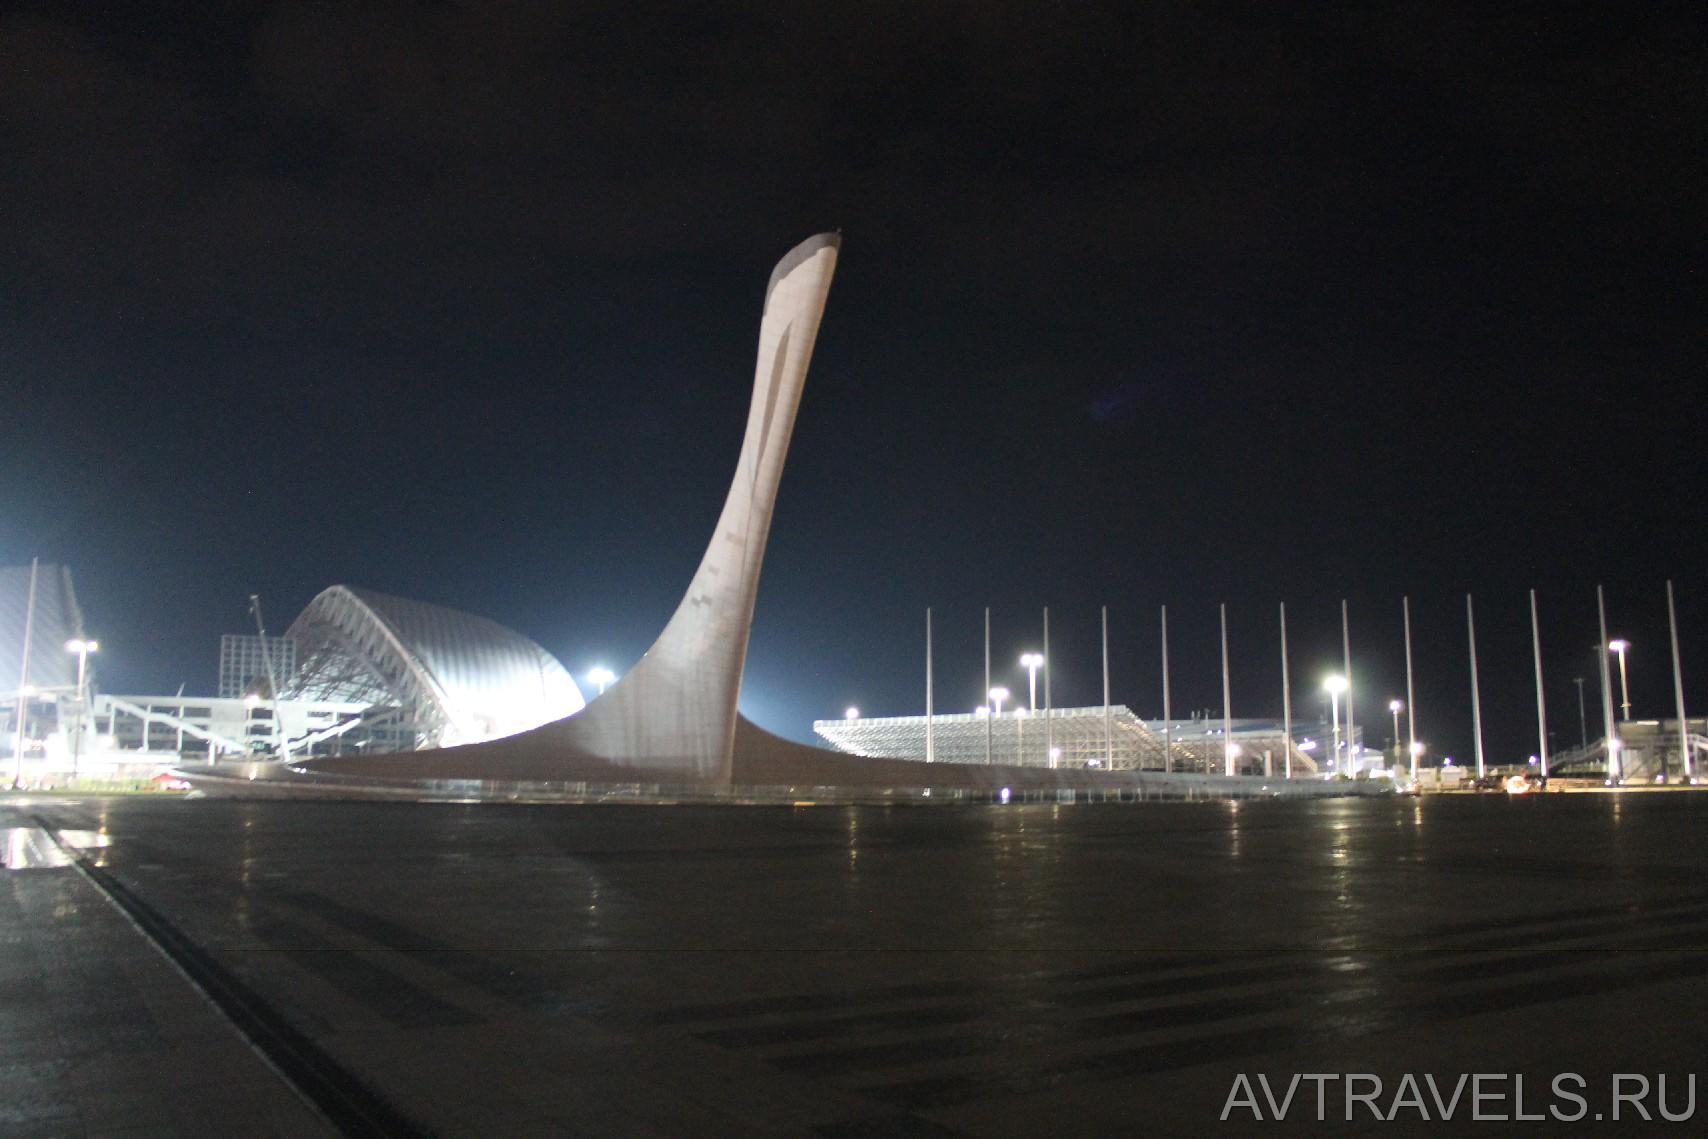 Олимпийская площадь Сочи